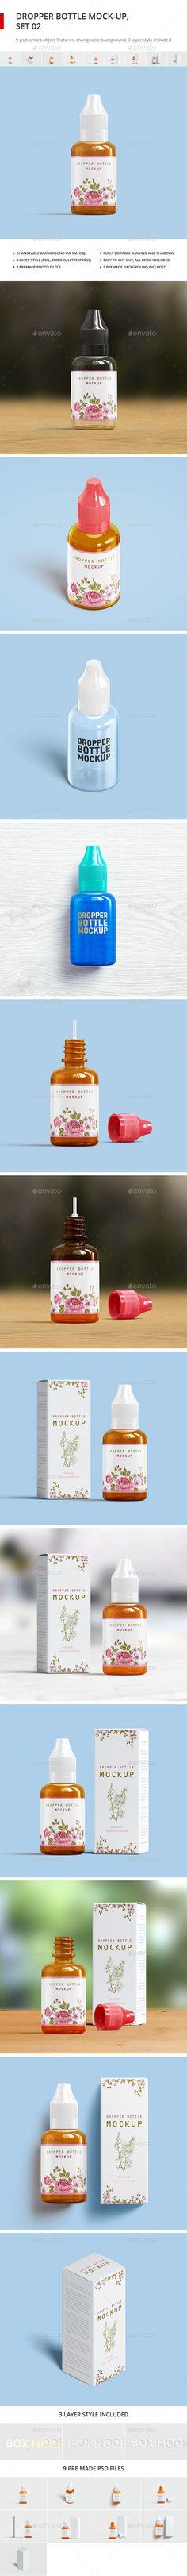 Dropper Bottle Mockup 2 — Photoshop PSD #medical #druggist • Available here → https://graphicriver.net/item/dropper-bottle-mockup-2/17996108?ref=pxcr